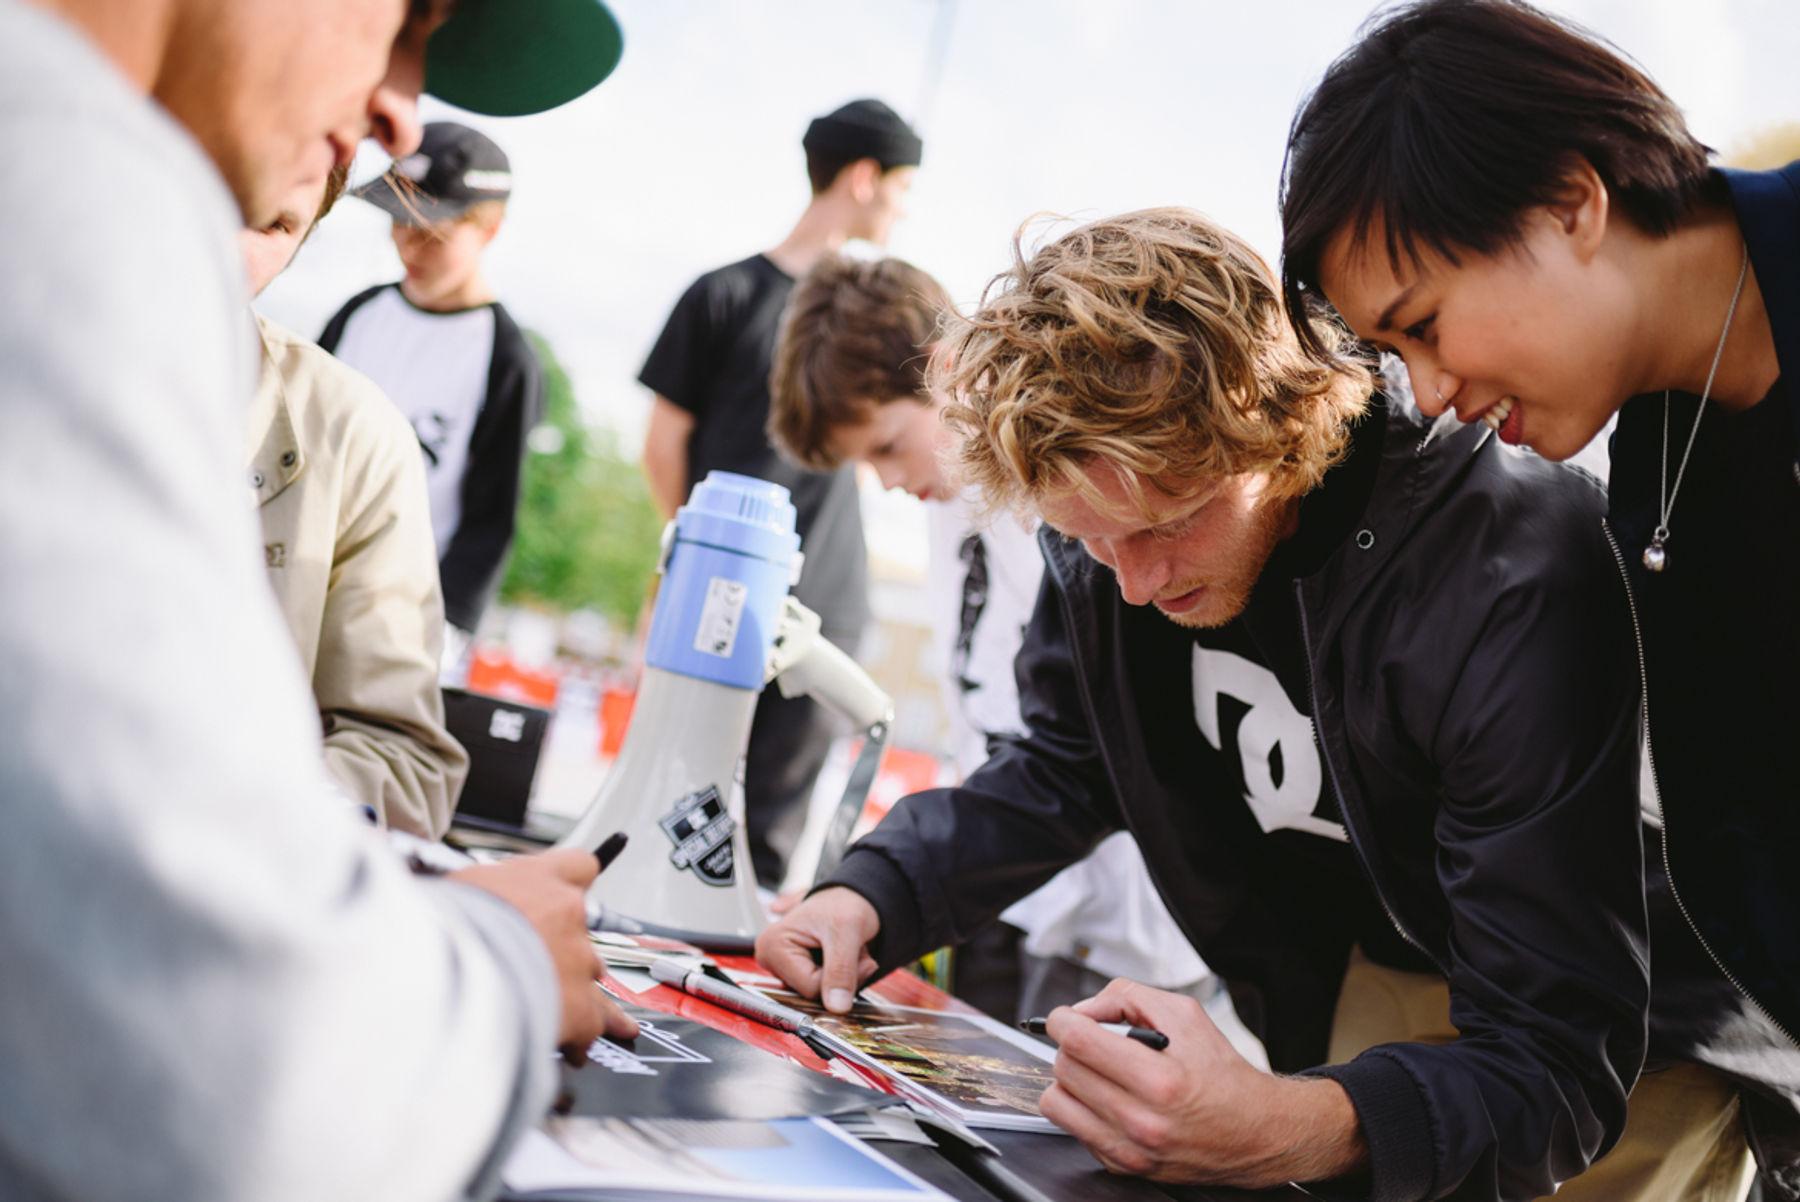 _IHC3740e-Antony-Lopez-Gosha-Konyshev-Wes-Kremer-DC-Special-Delivery-Skate-Tour-BTS-Demo-Mile-End-London-May-2015-Photographer-Maksim-Kalanep